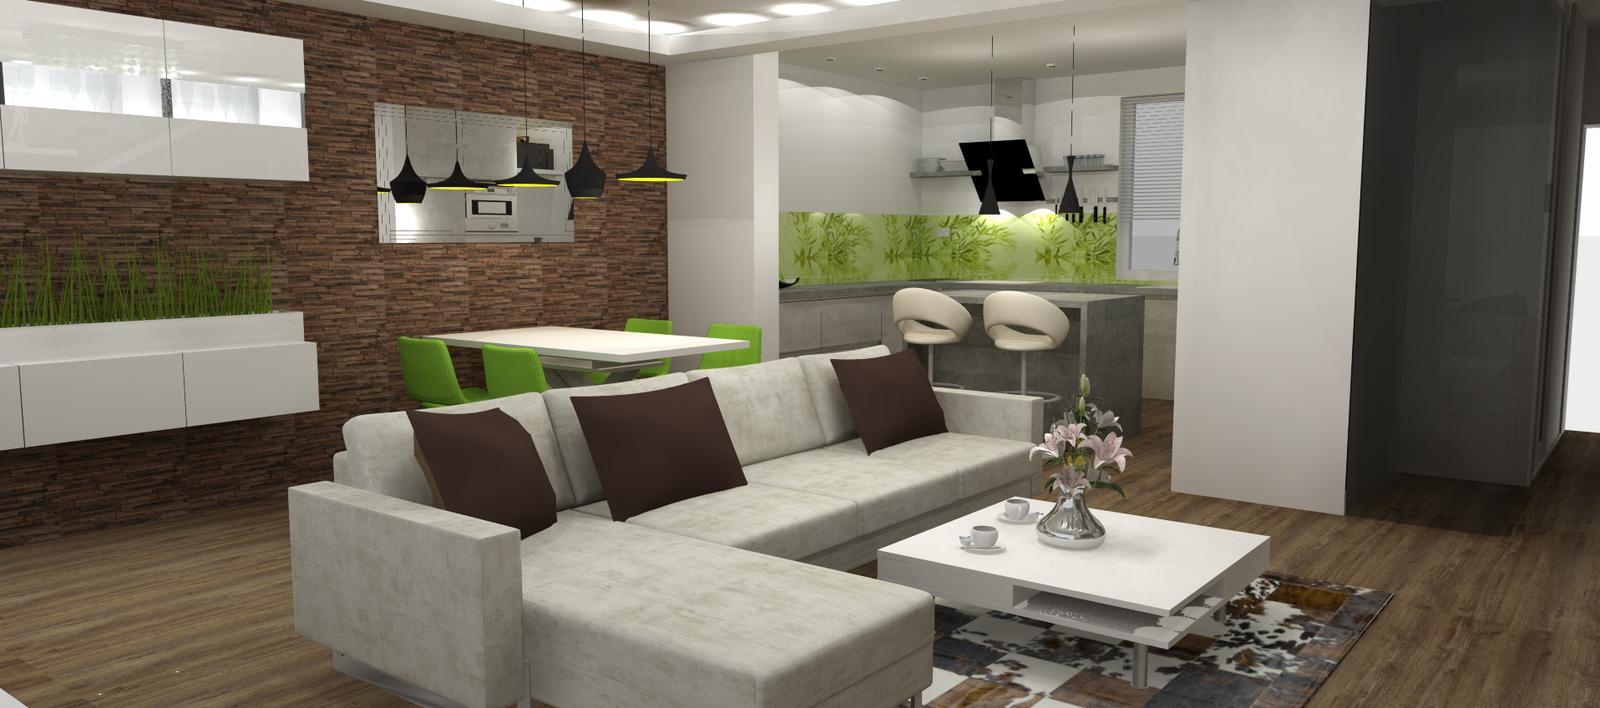 Obývačko-kuchyne I. - Obrázok č. 183